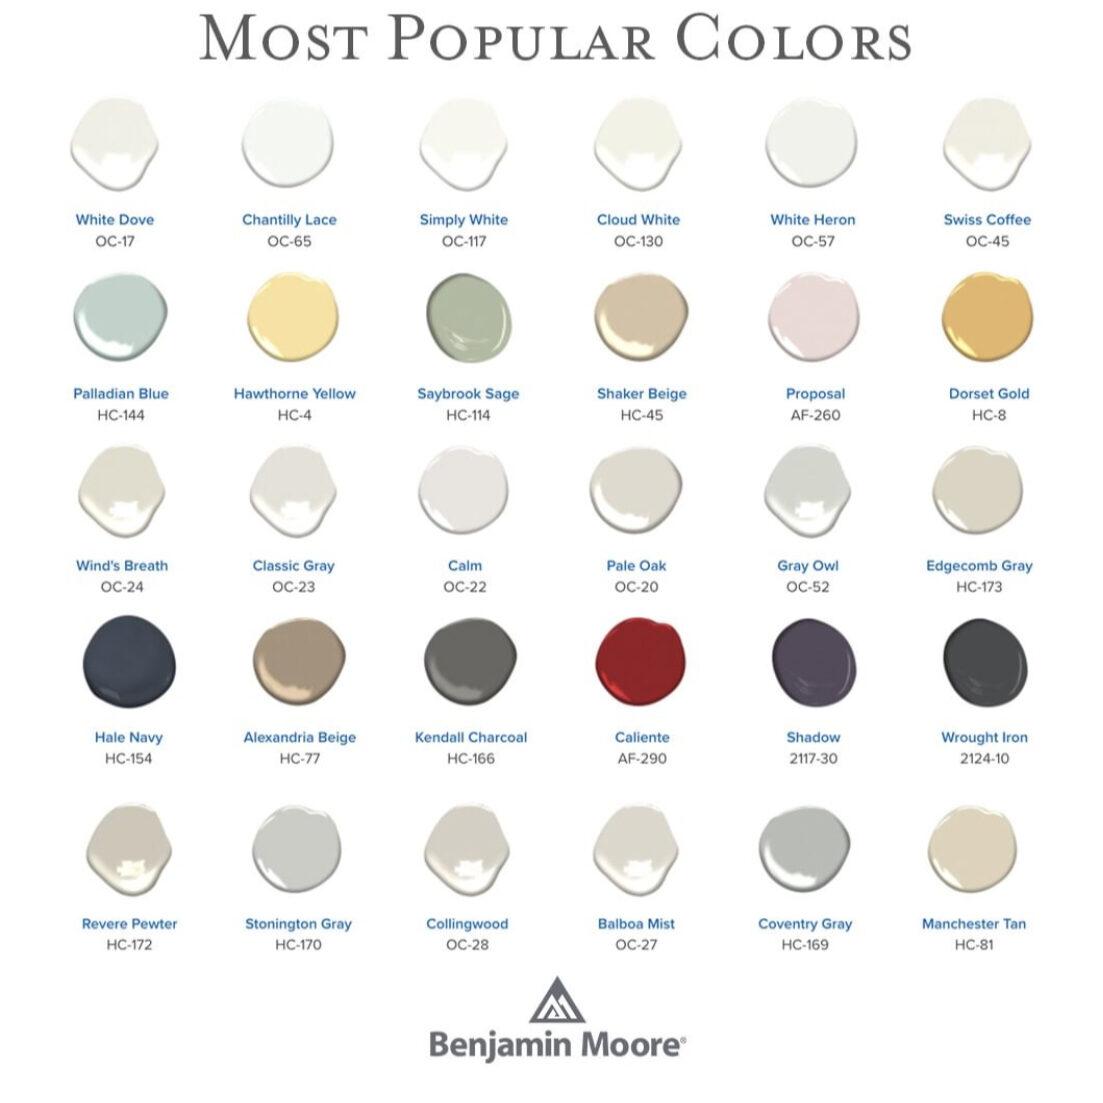 Benjamin Moore Most Popular Colors